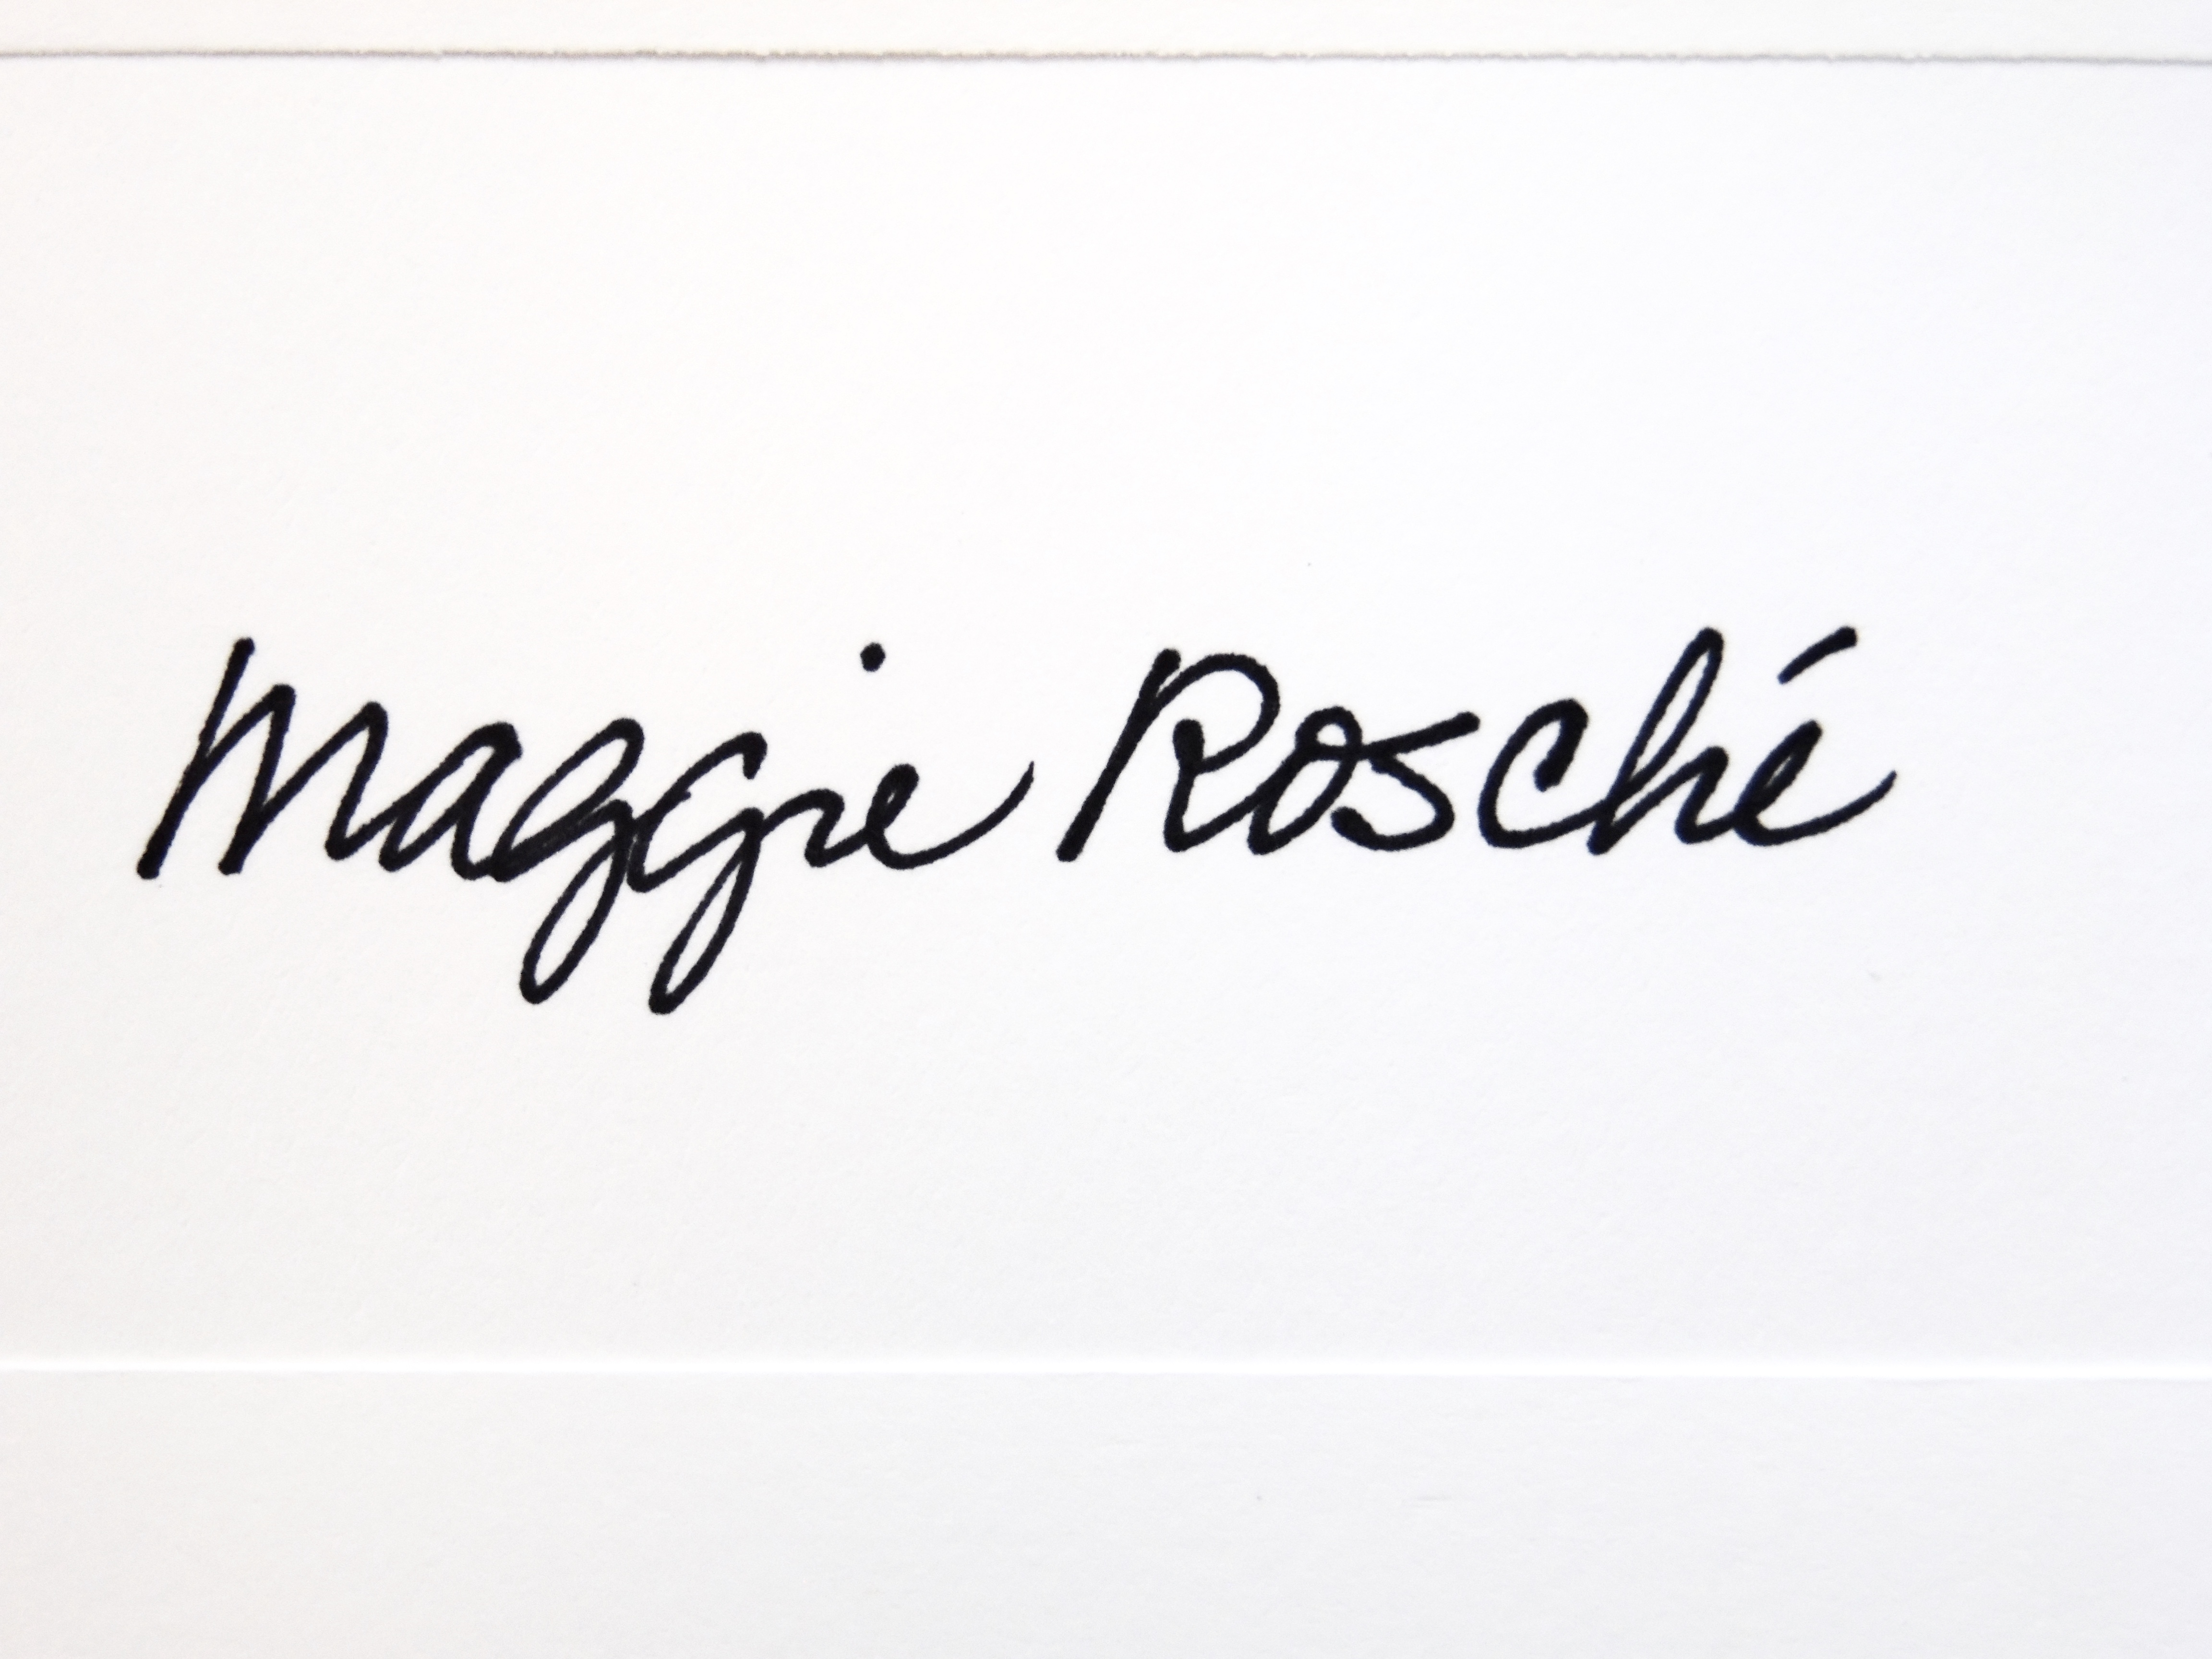 Maggie Rosché Signature